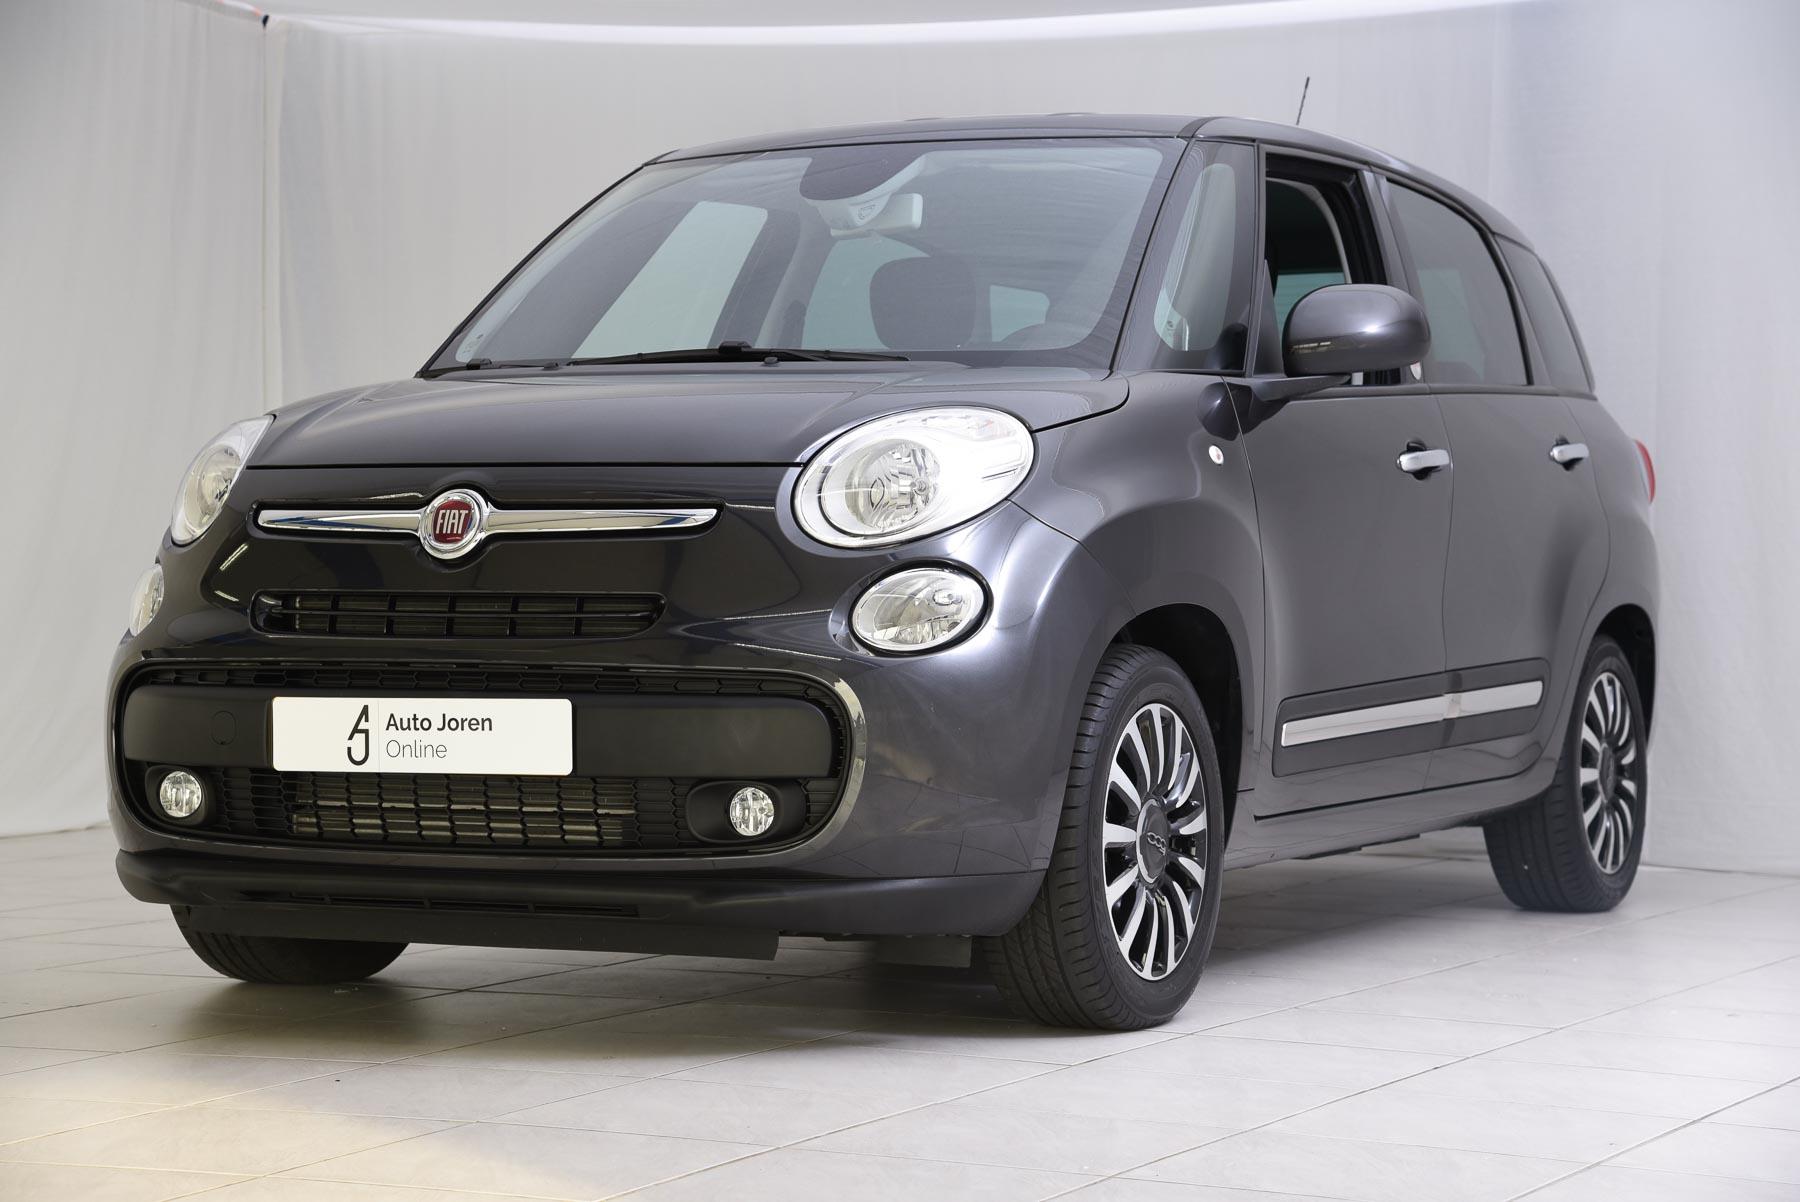 Fiat 500L Living Lounge financieren?